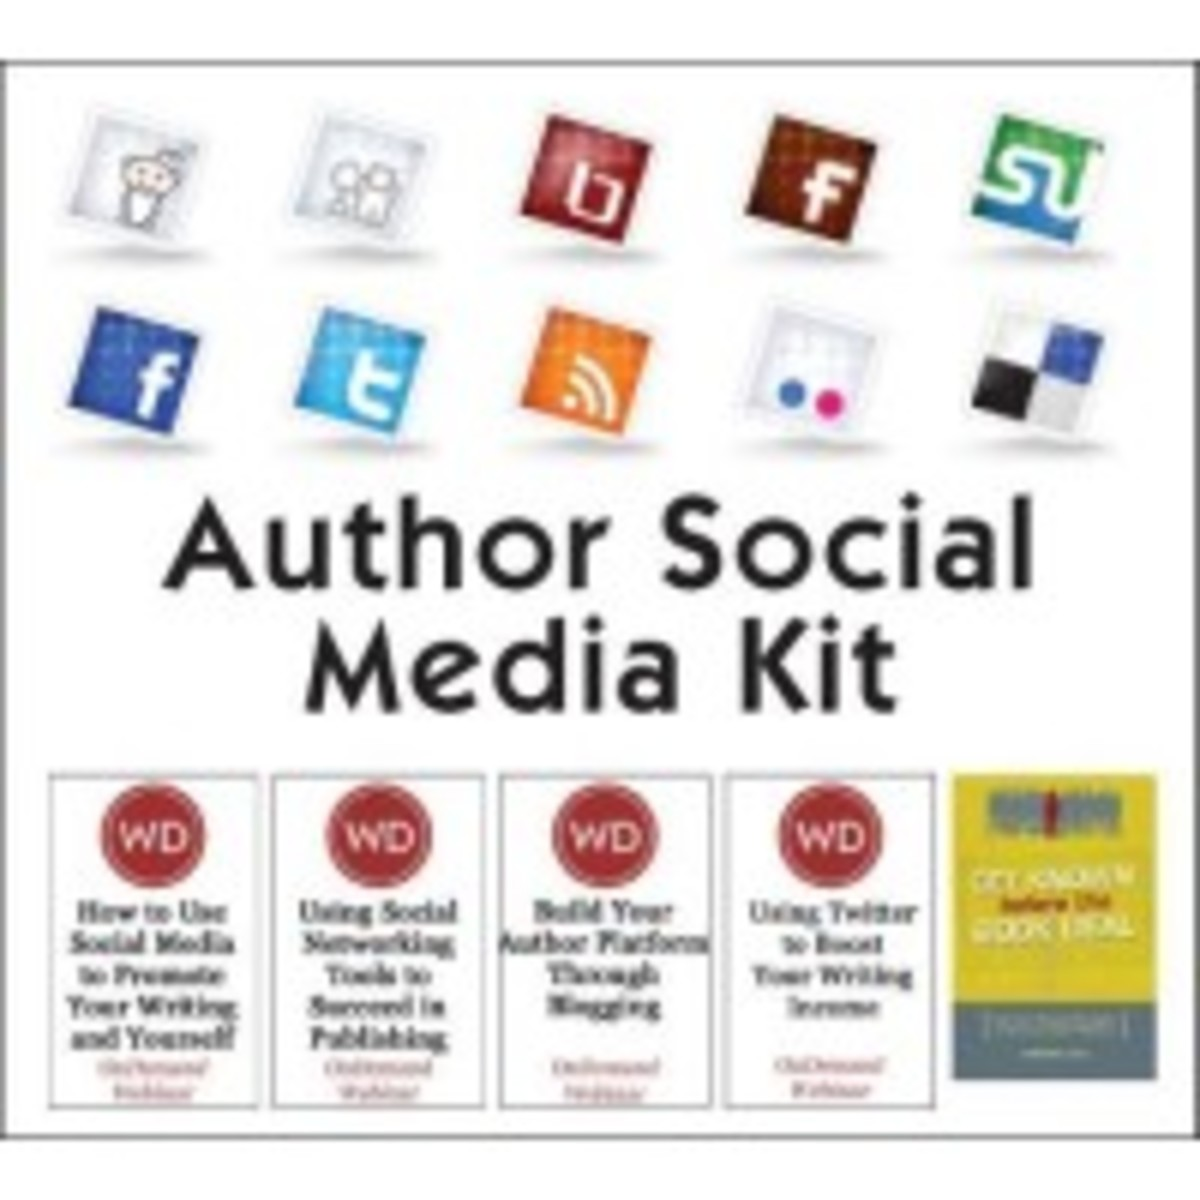 Author Social Media kit